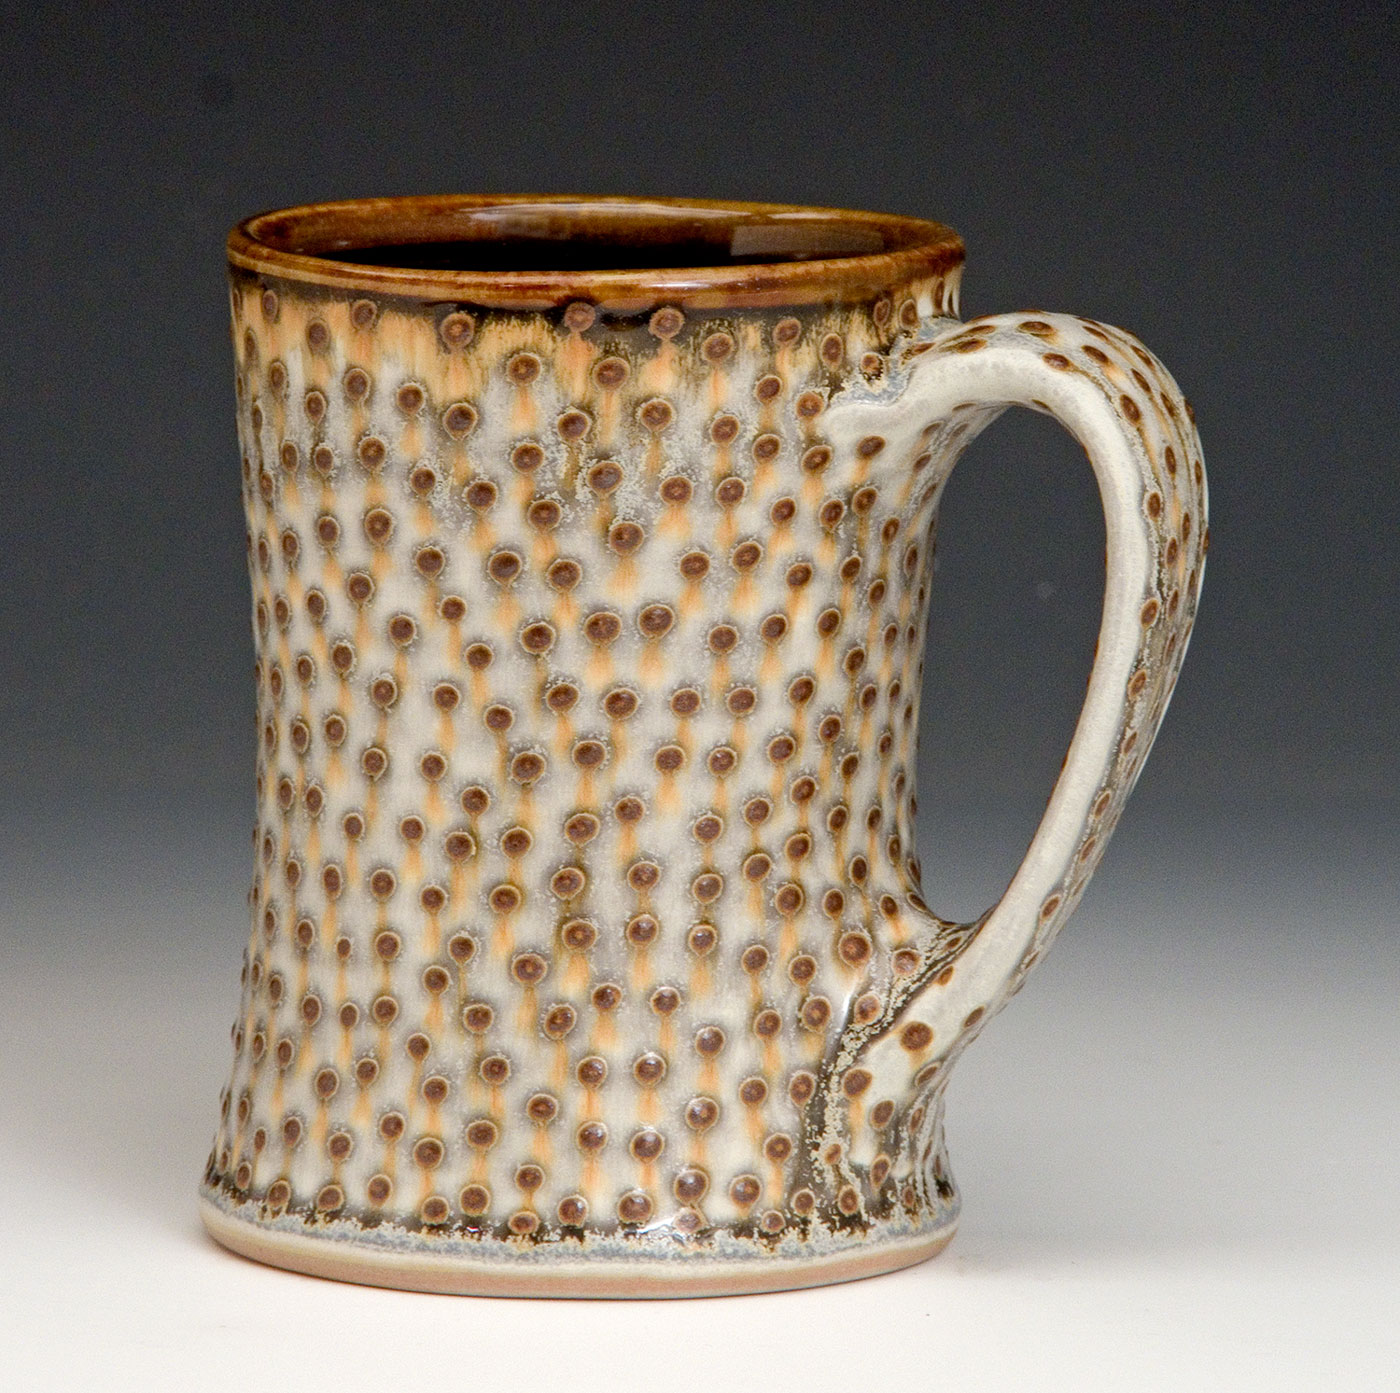 Handmade-Pottery-Stein-Samantha-Henneke-Bulldog-Pottery.jpg